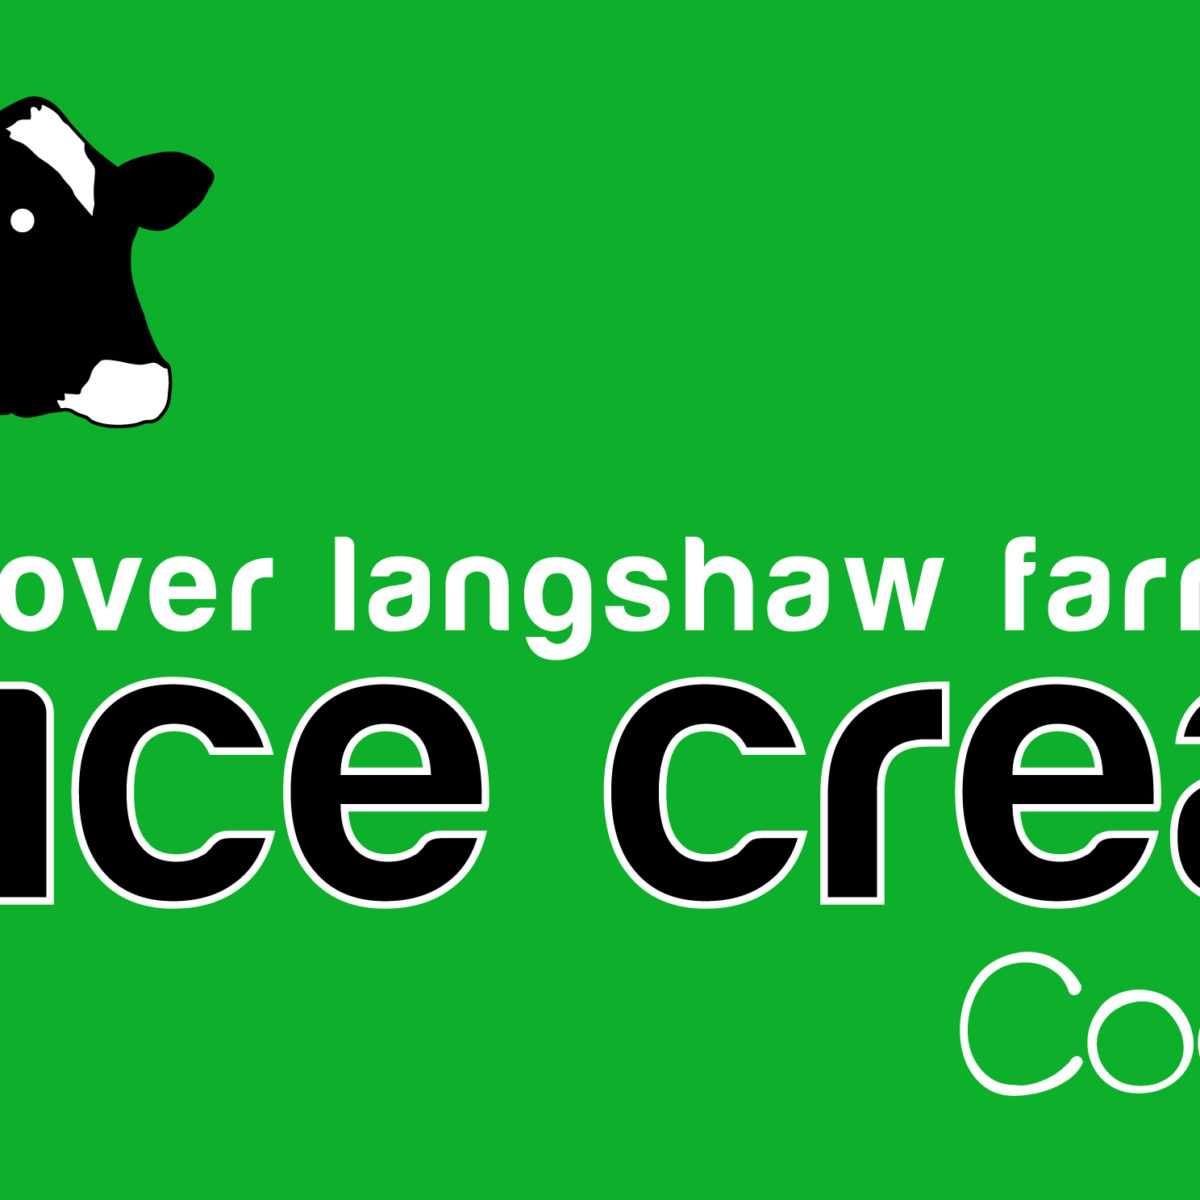 over langshaw ice cream logo